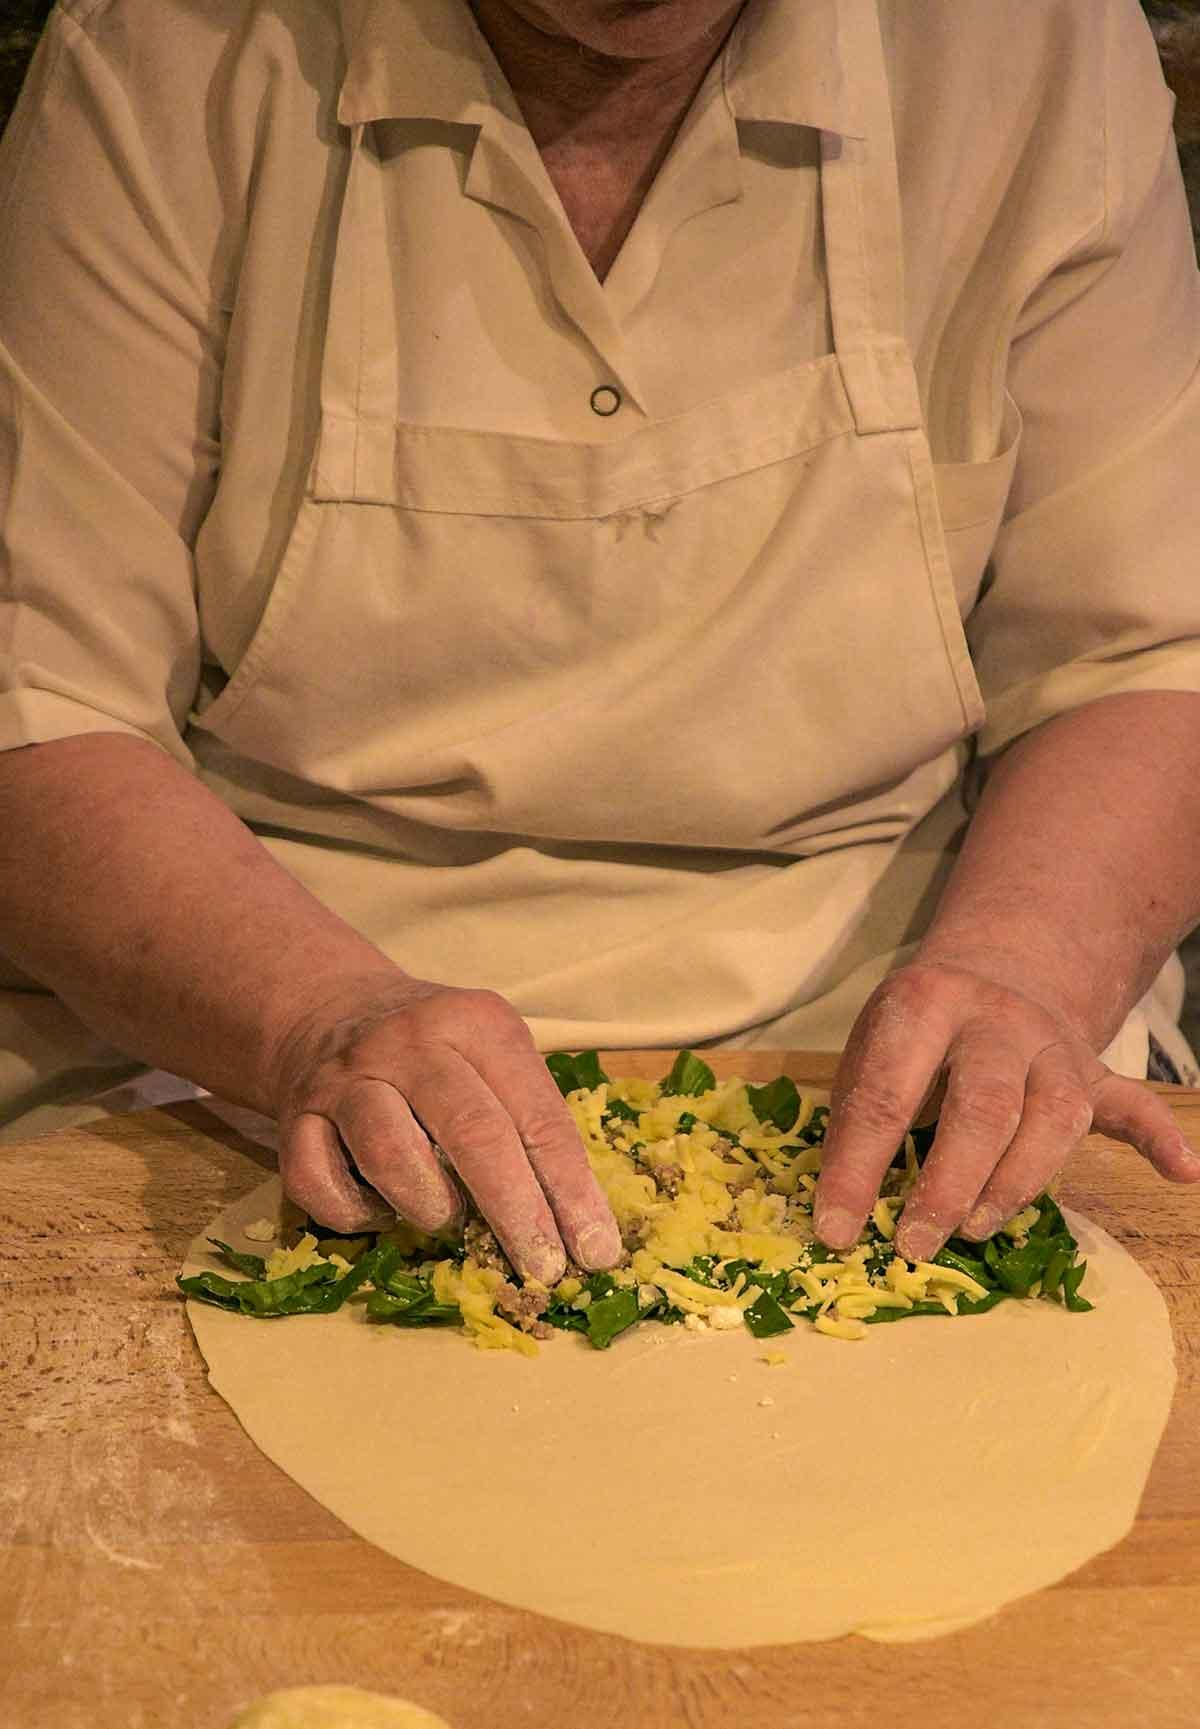 donna che cucina a Istanbul